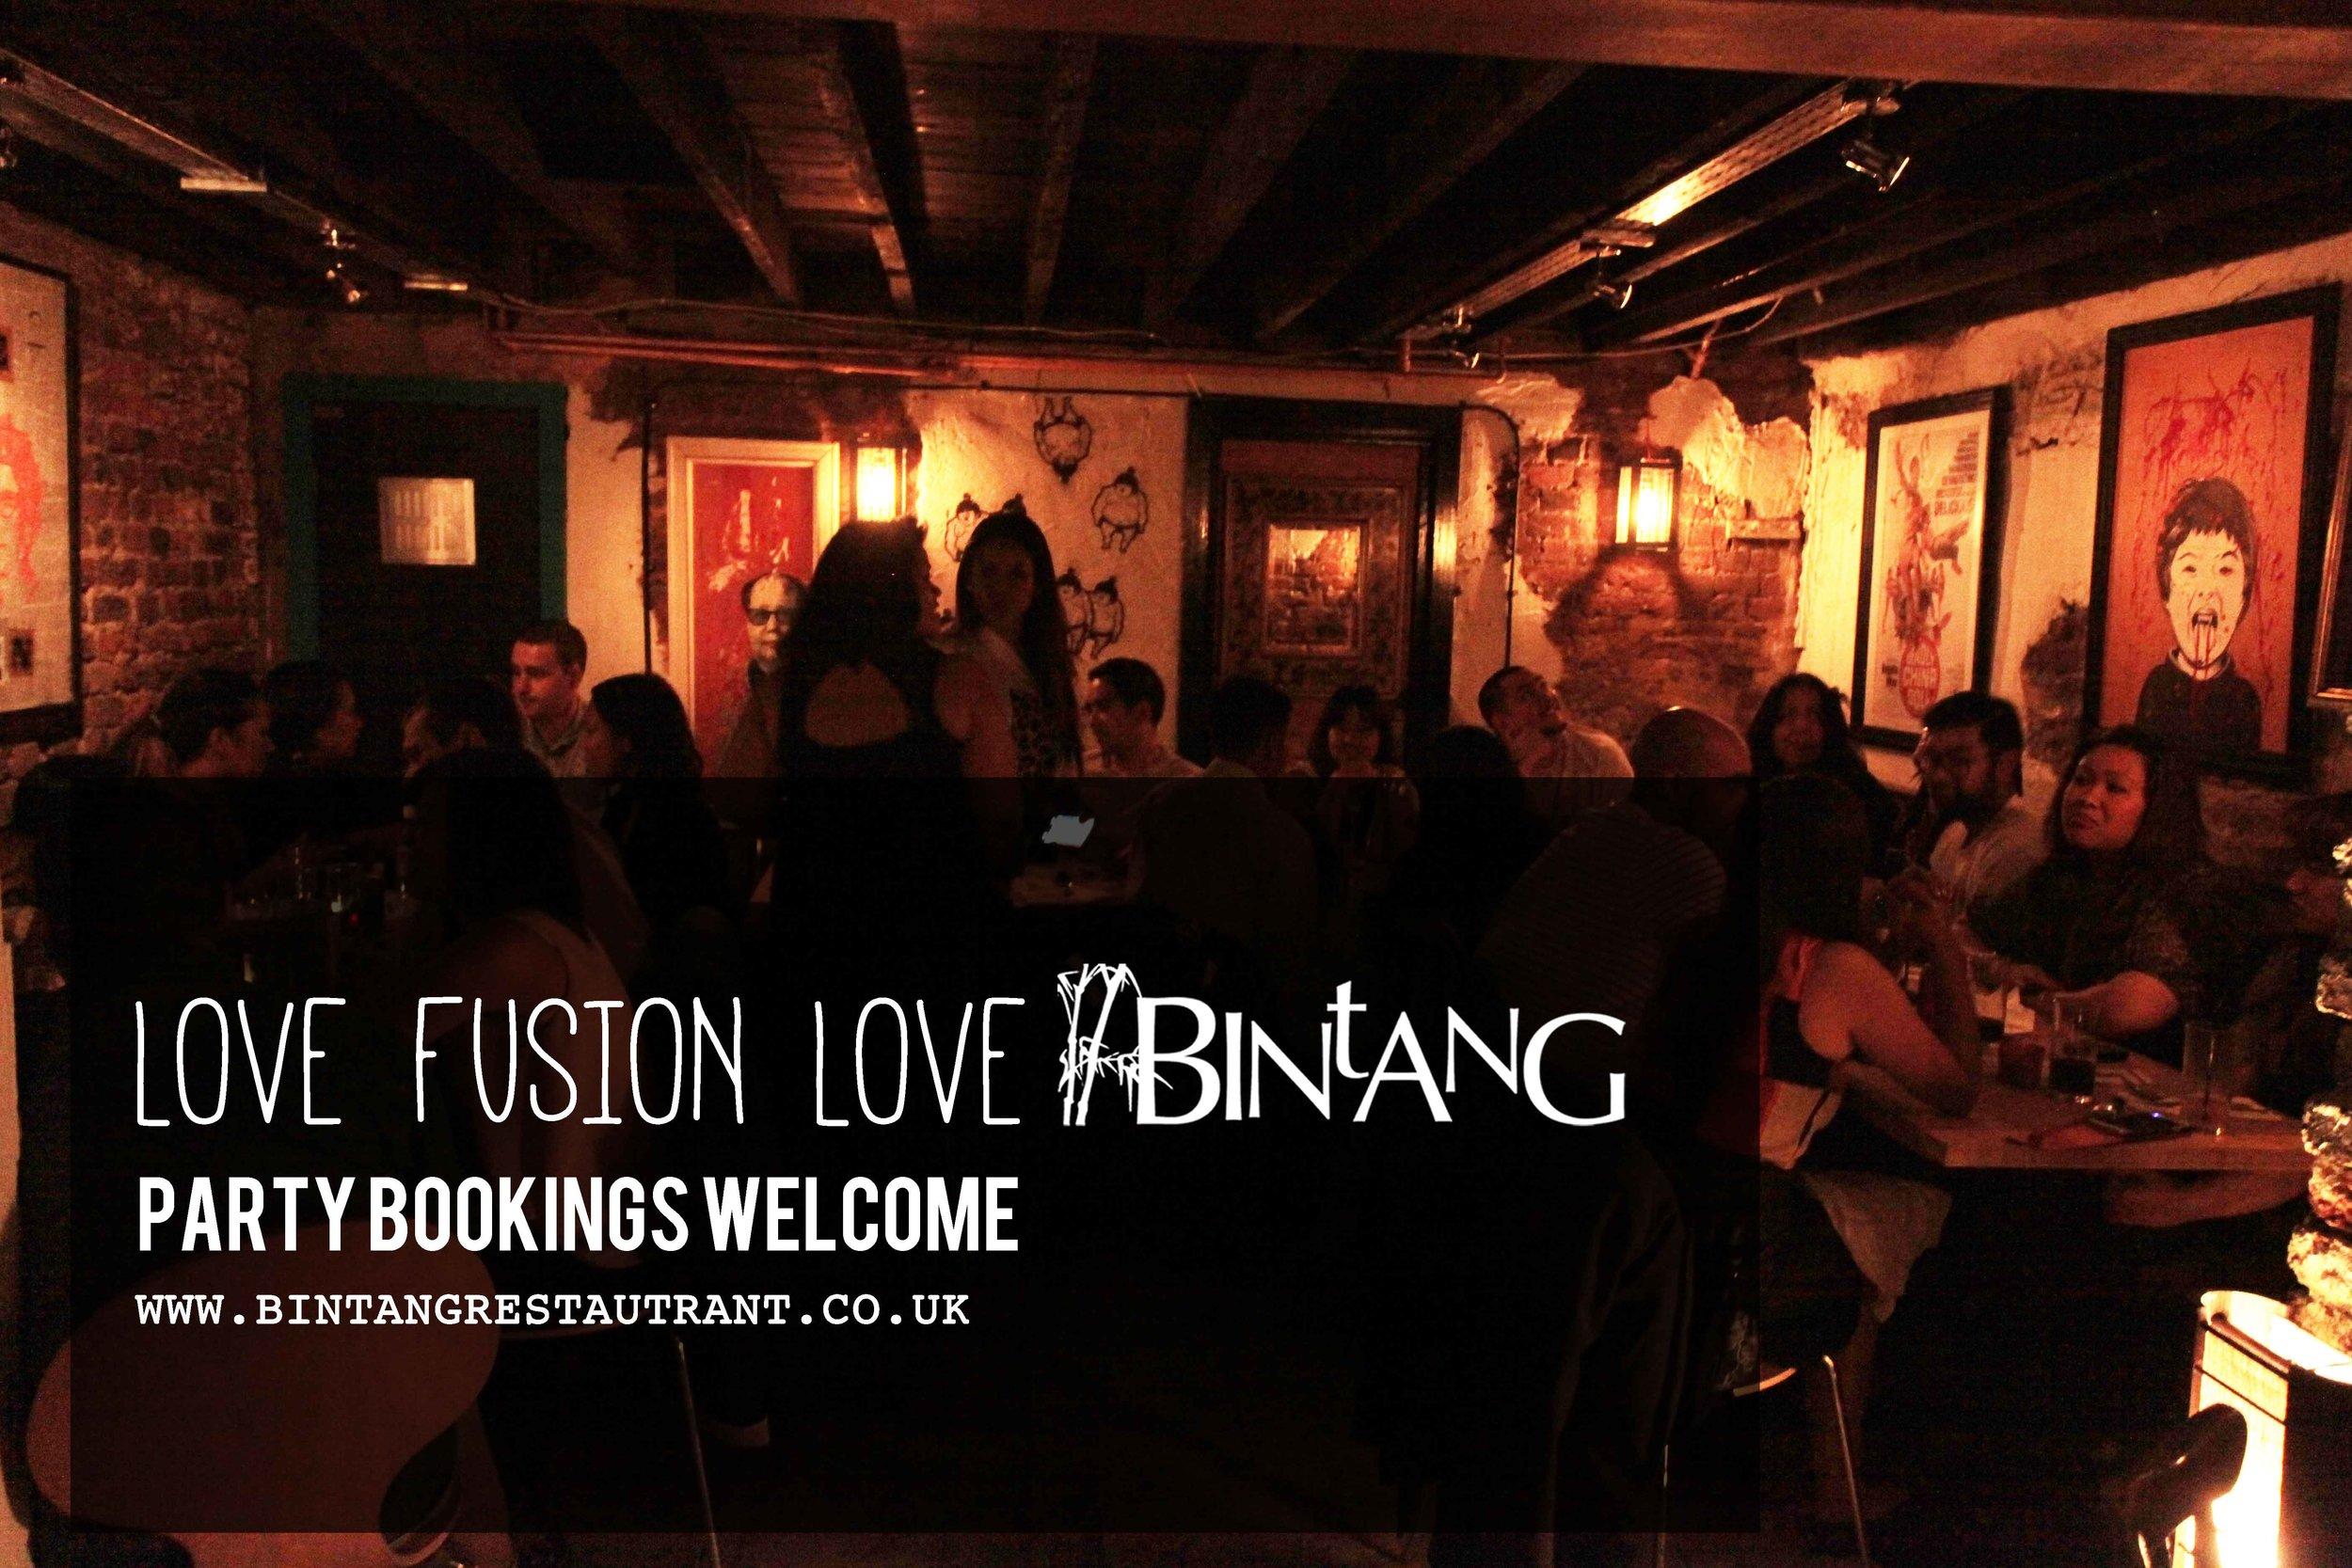 Bintang-Pan-Asian-Restaurant-Love-Fusion-Party-Photograph-2013.jpg